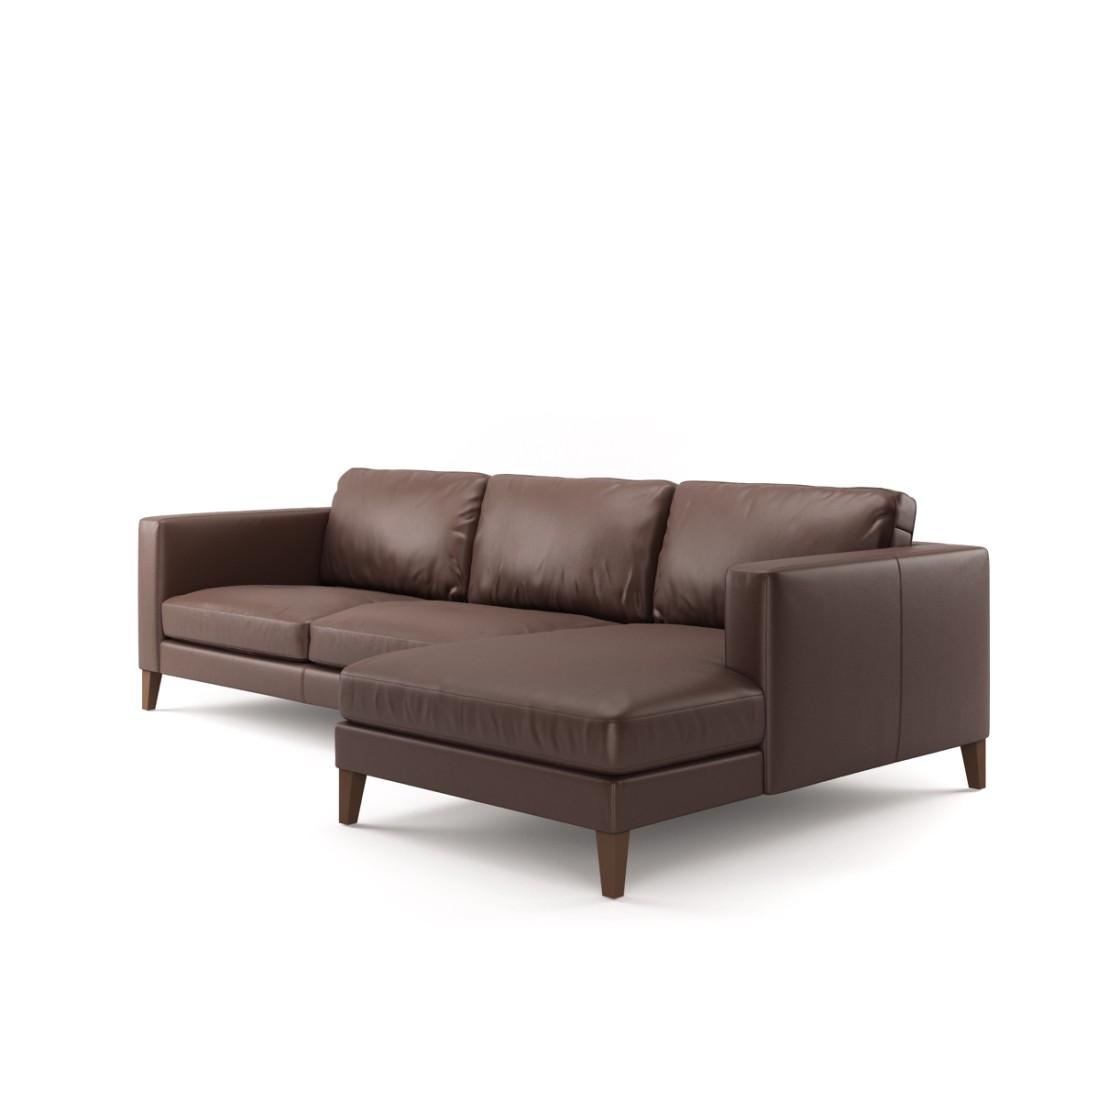 ottomane recamiere awesome zur with ottomane recamiere ecksofa cromwell webstoff links grau. Black Bedroom Furniture Sets. Home Design Ideas